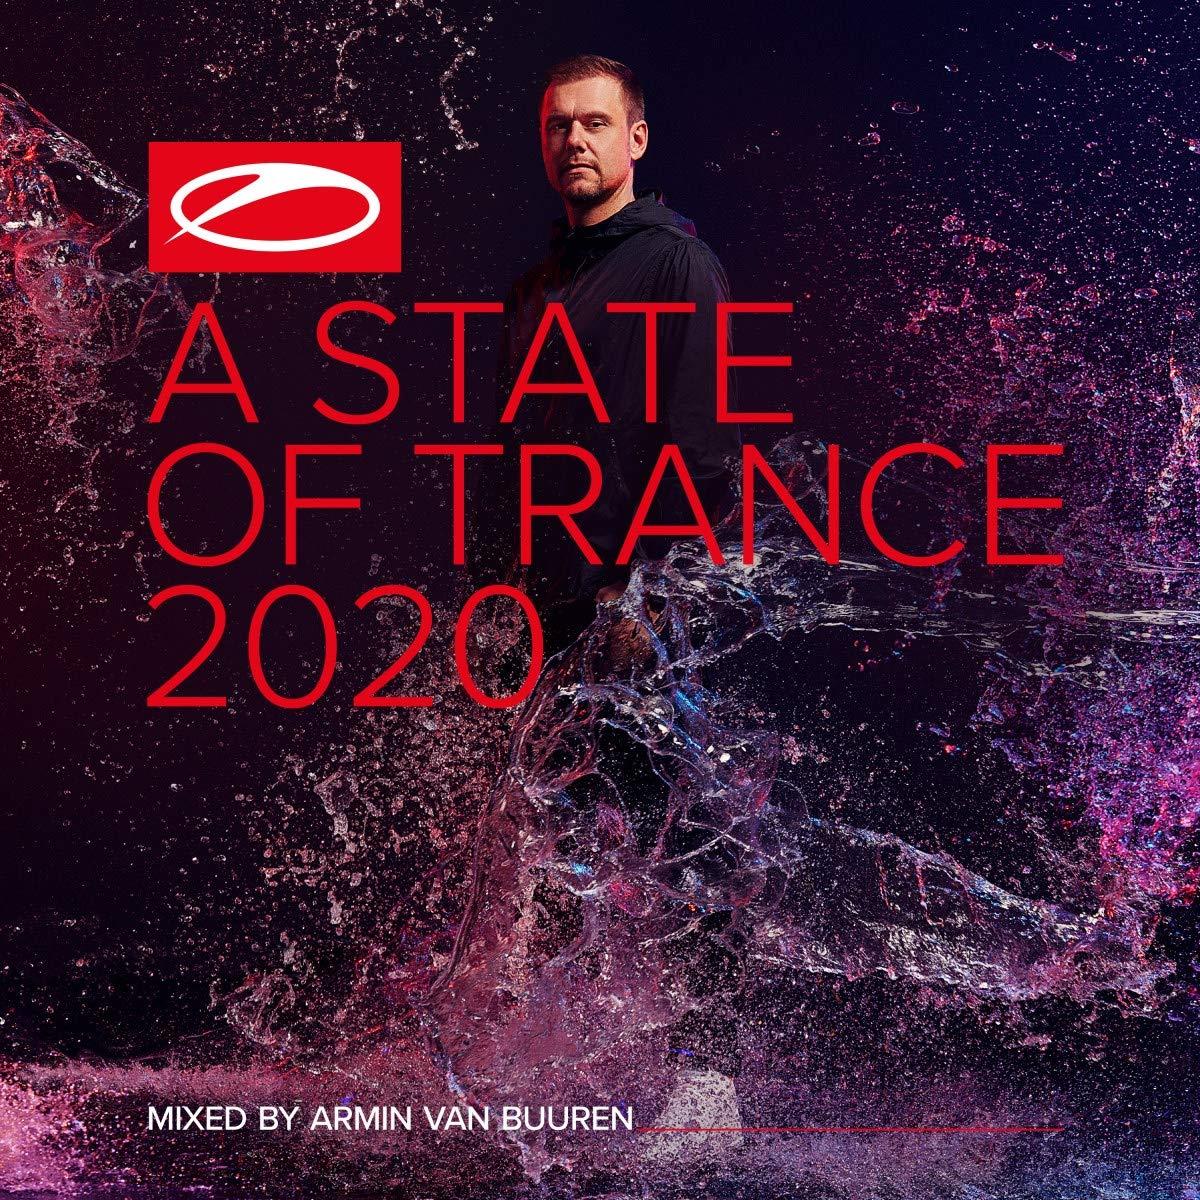 VA – A State Of Trance 2020 Mixed by Armin van Buuren (2020) [FLAC]